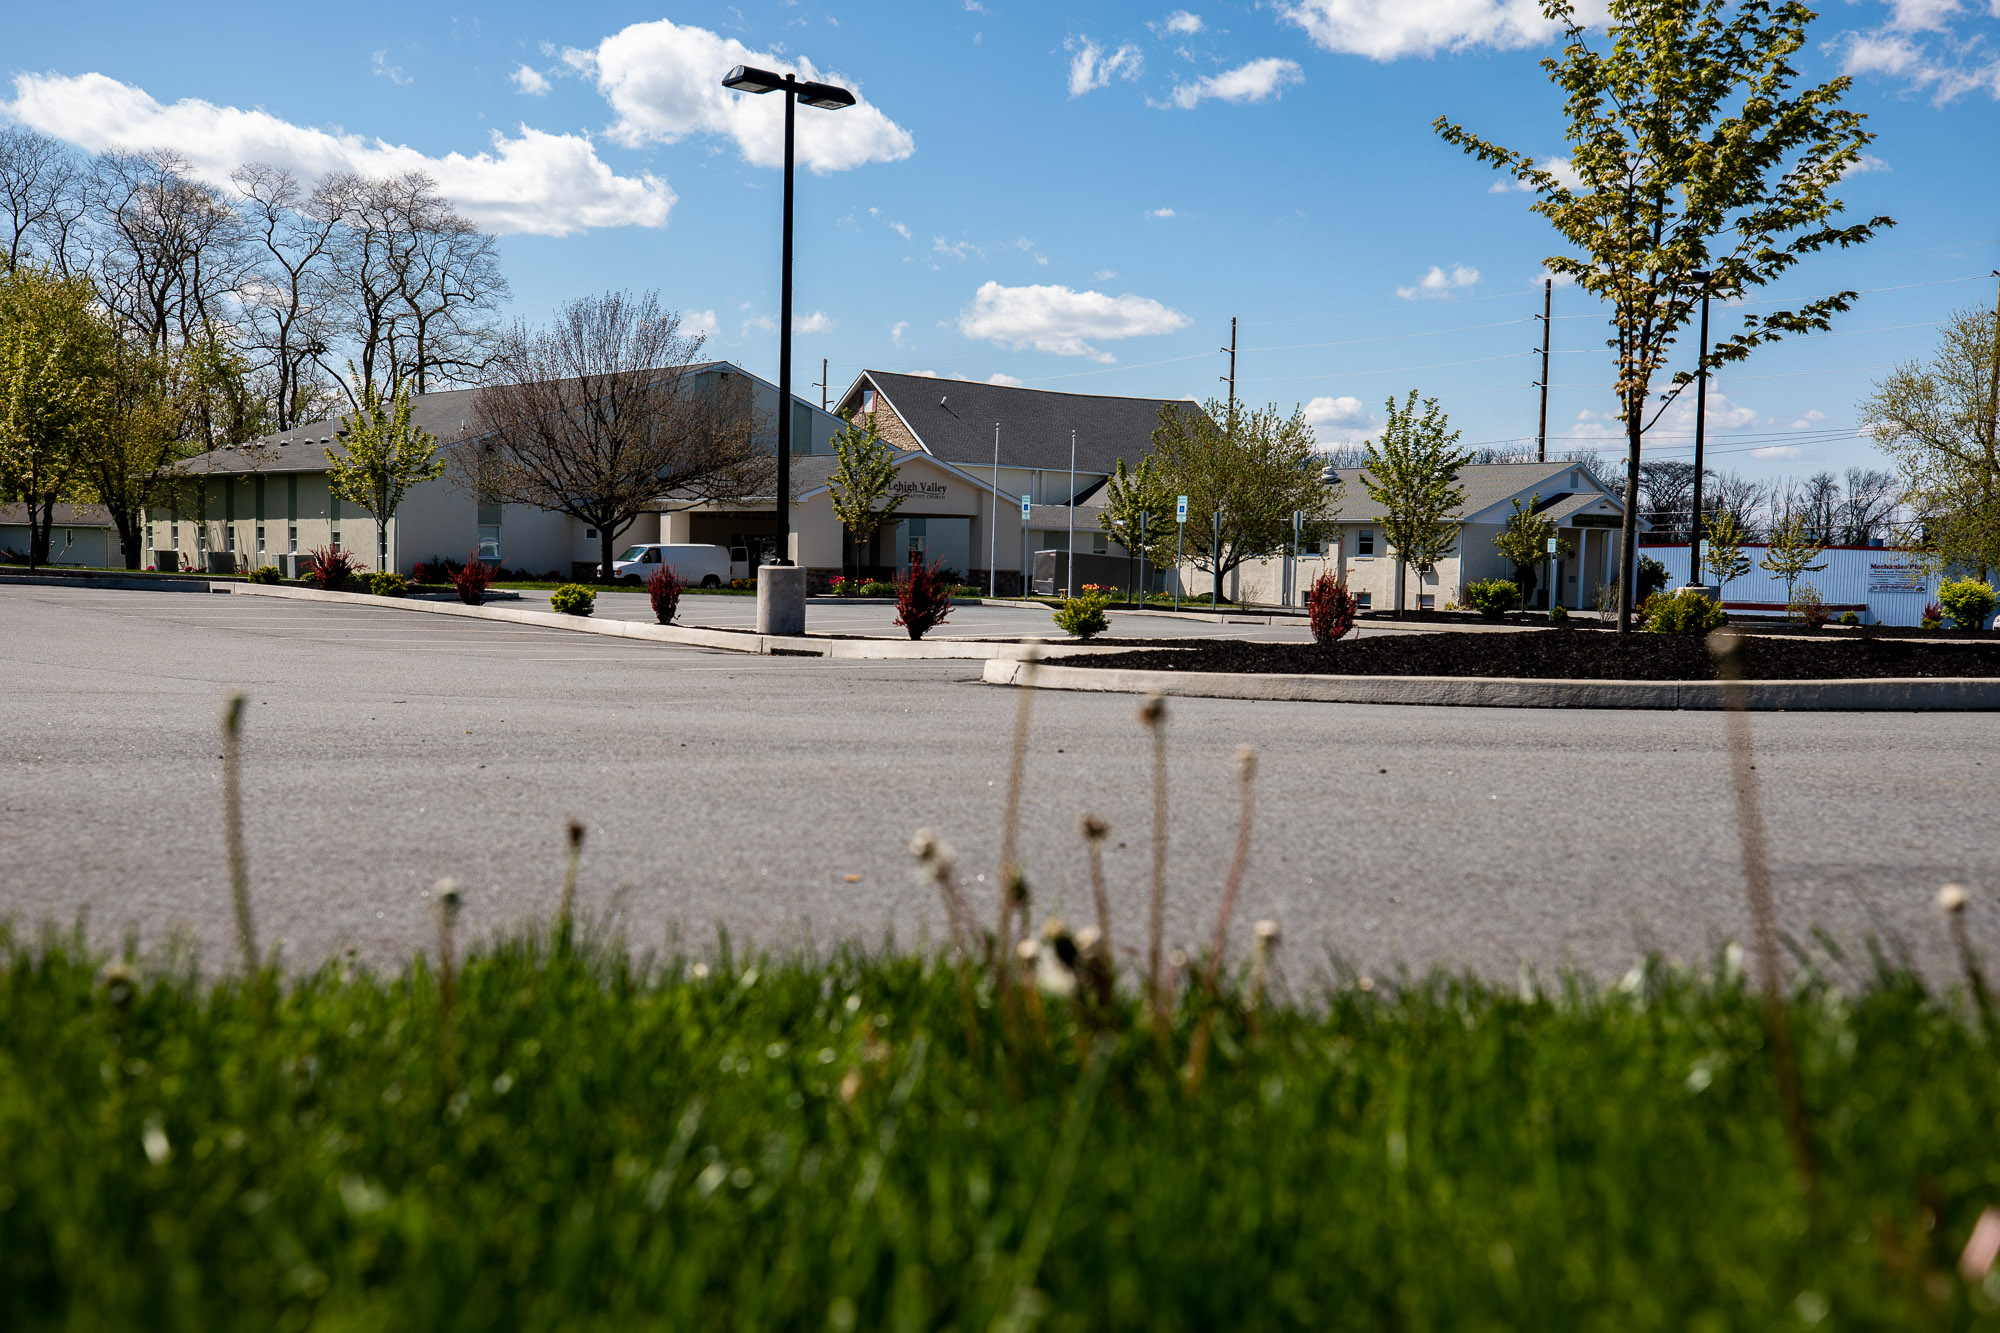 Lehigh Valley Baptist Church Parking